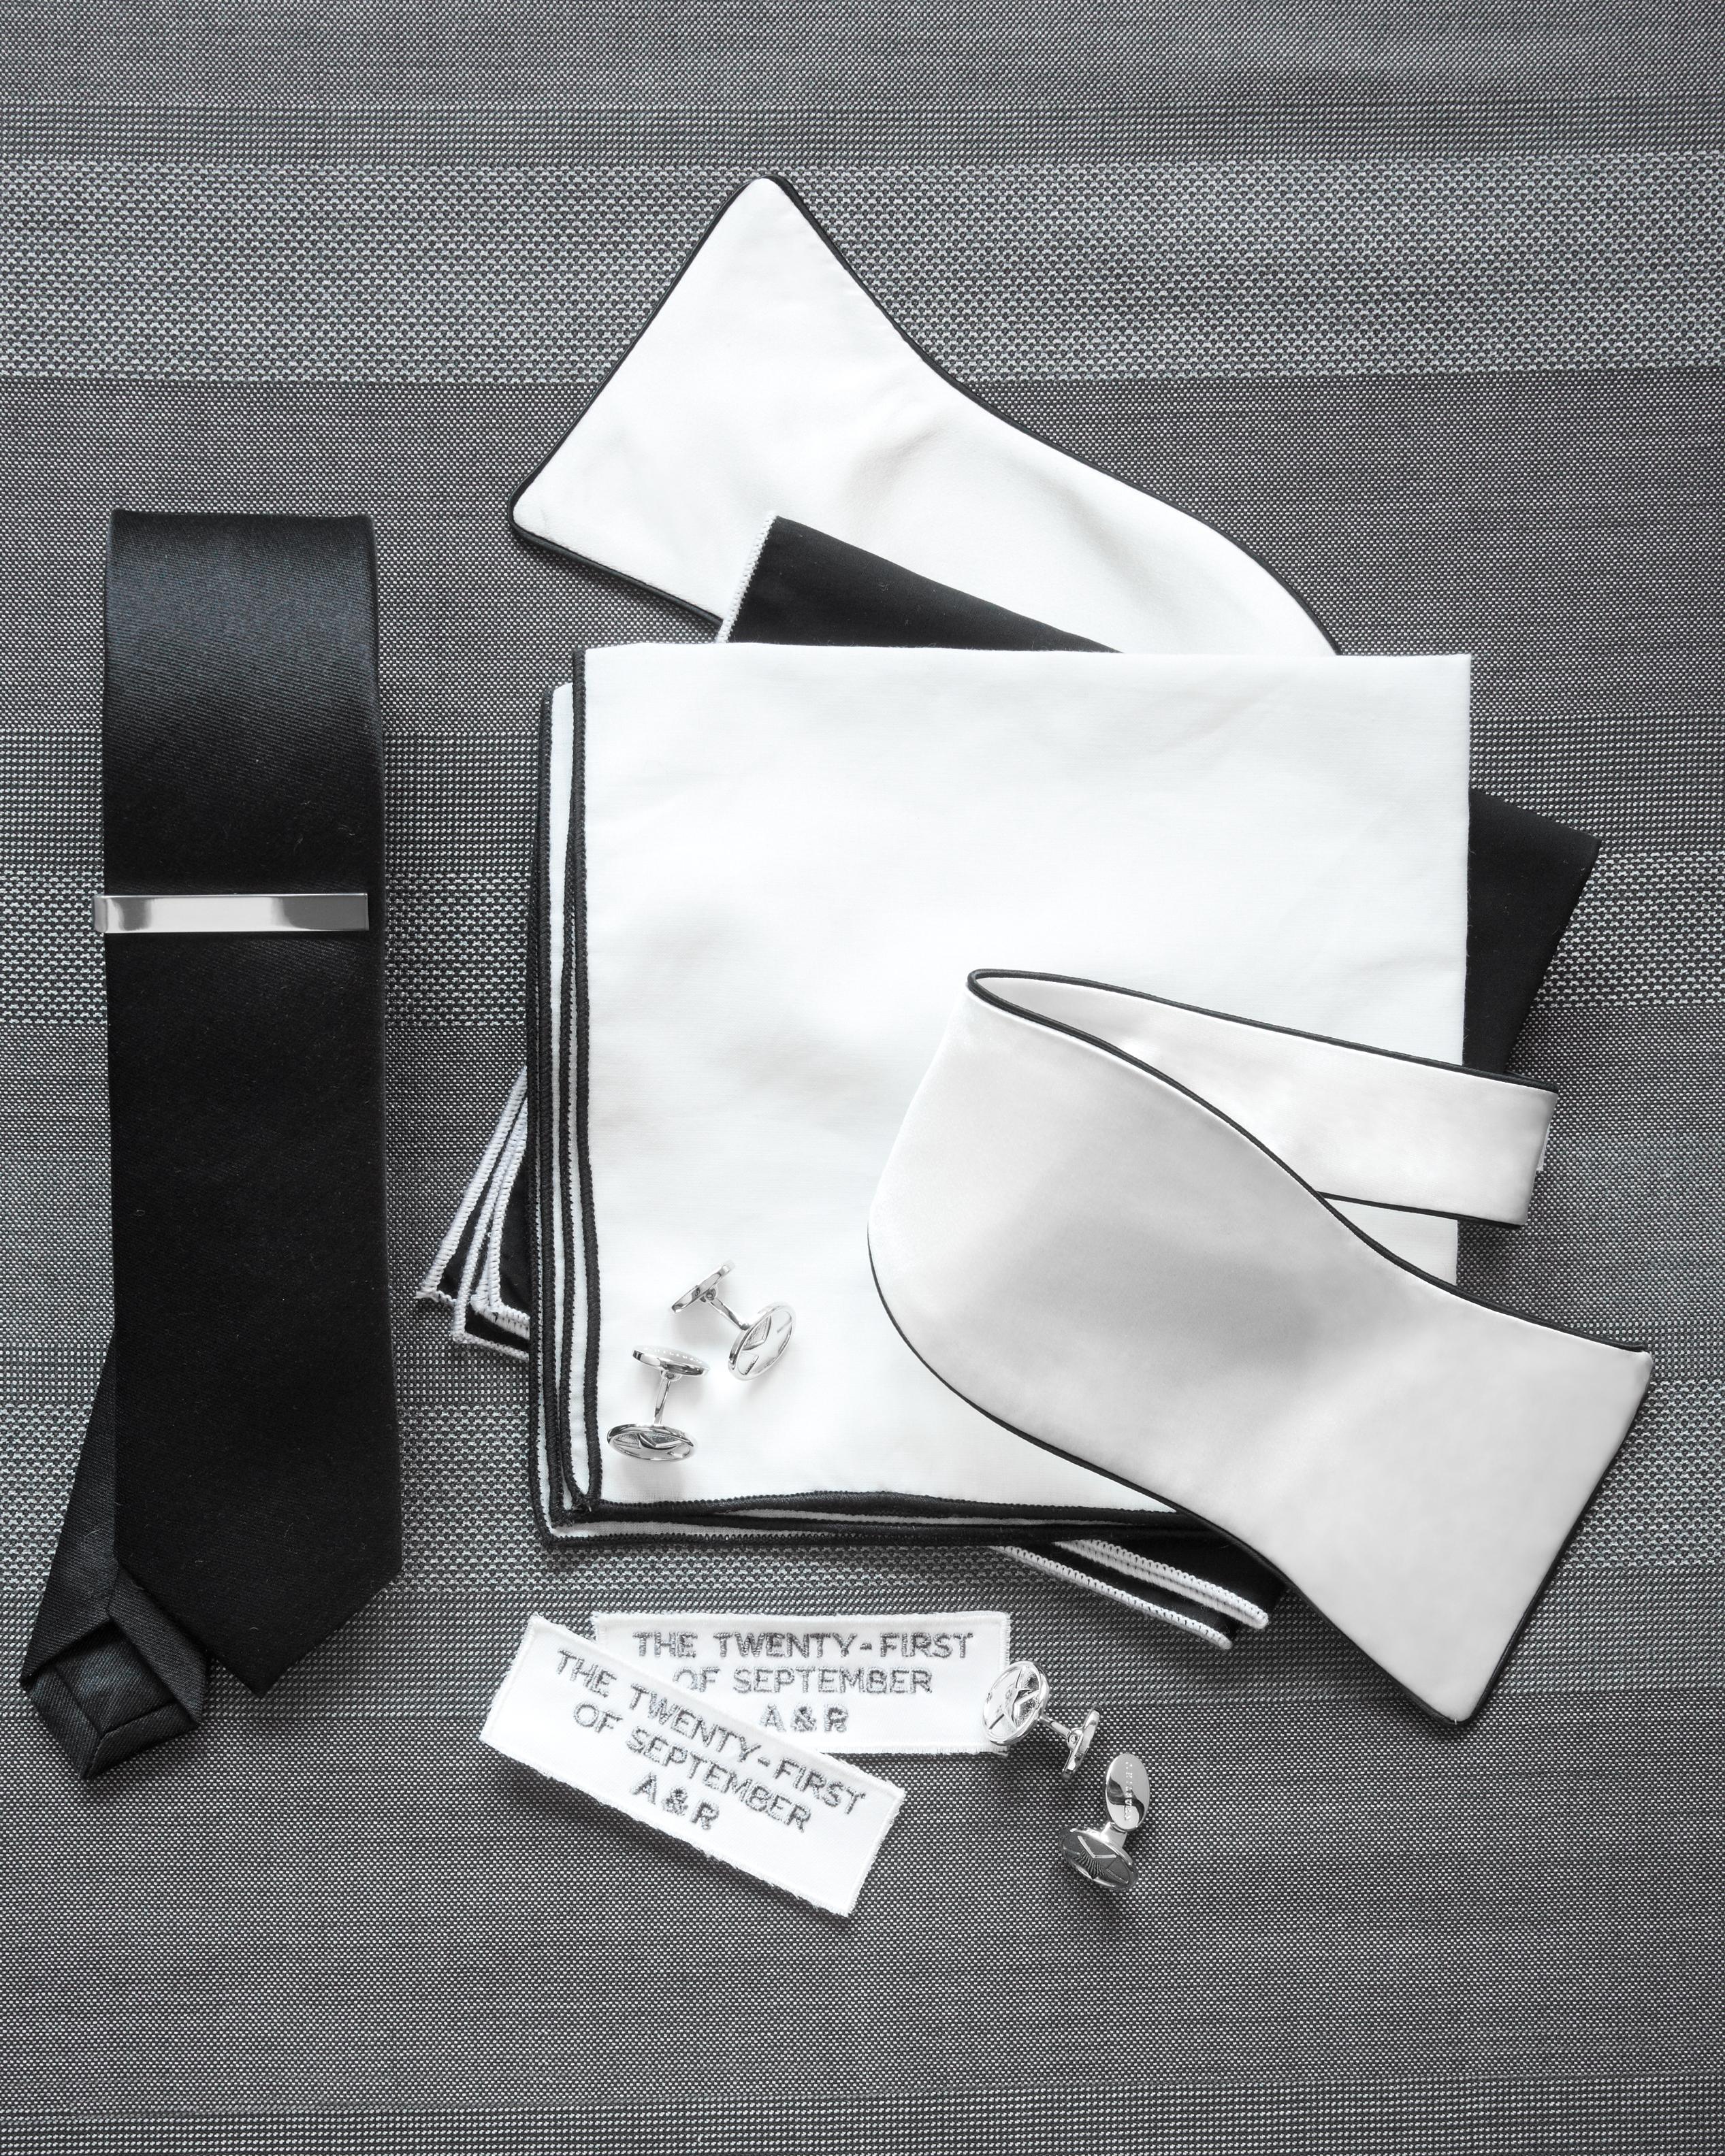 rw-anthony-rusty-tie-cufflink-13-354-00383-wd110176.jpg